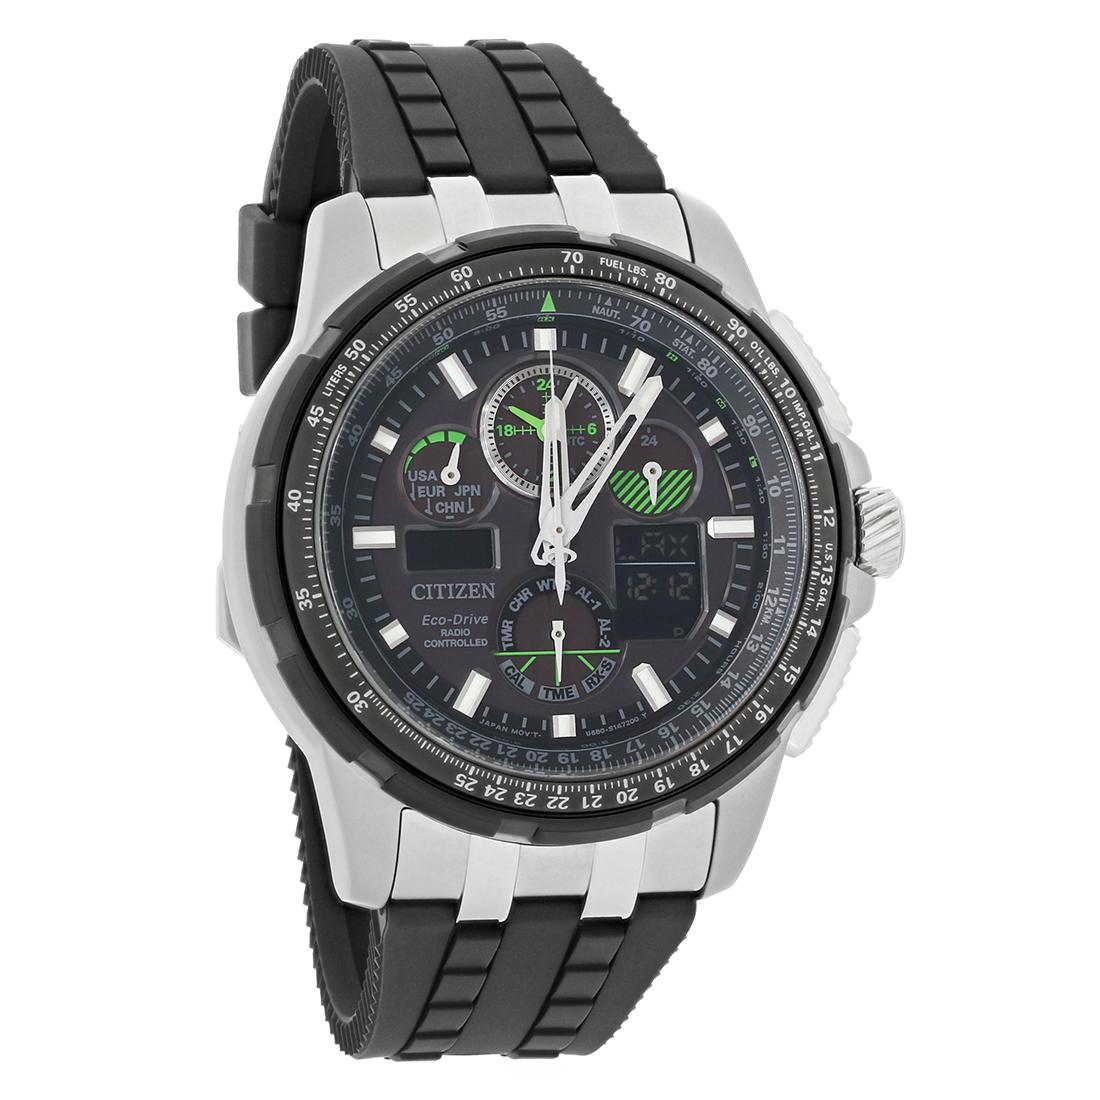 Citizen skyhawk a t mens alarm flight eco drive chronograph watch jy8051 08e ebay for Eco drive watch